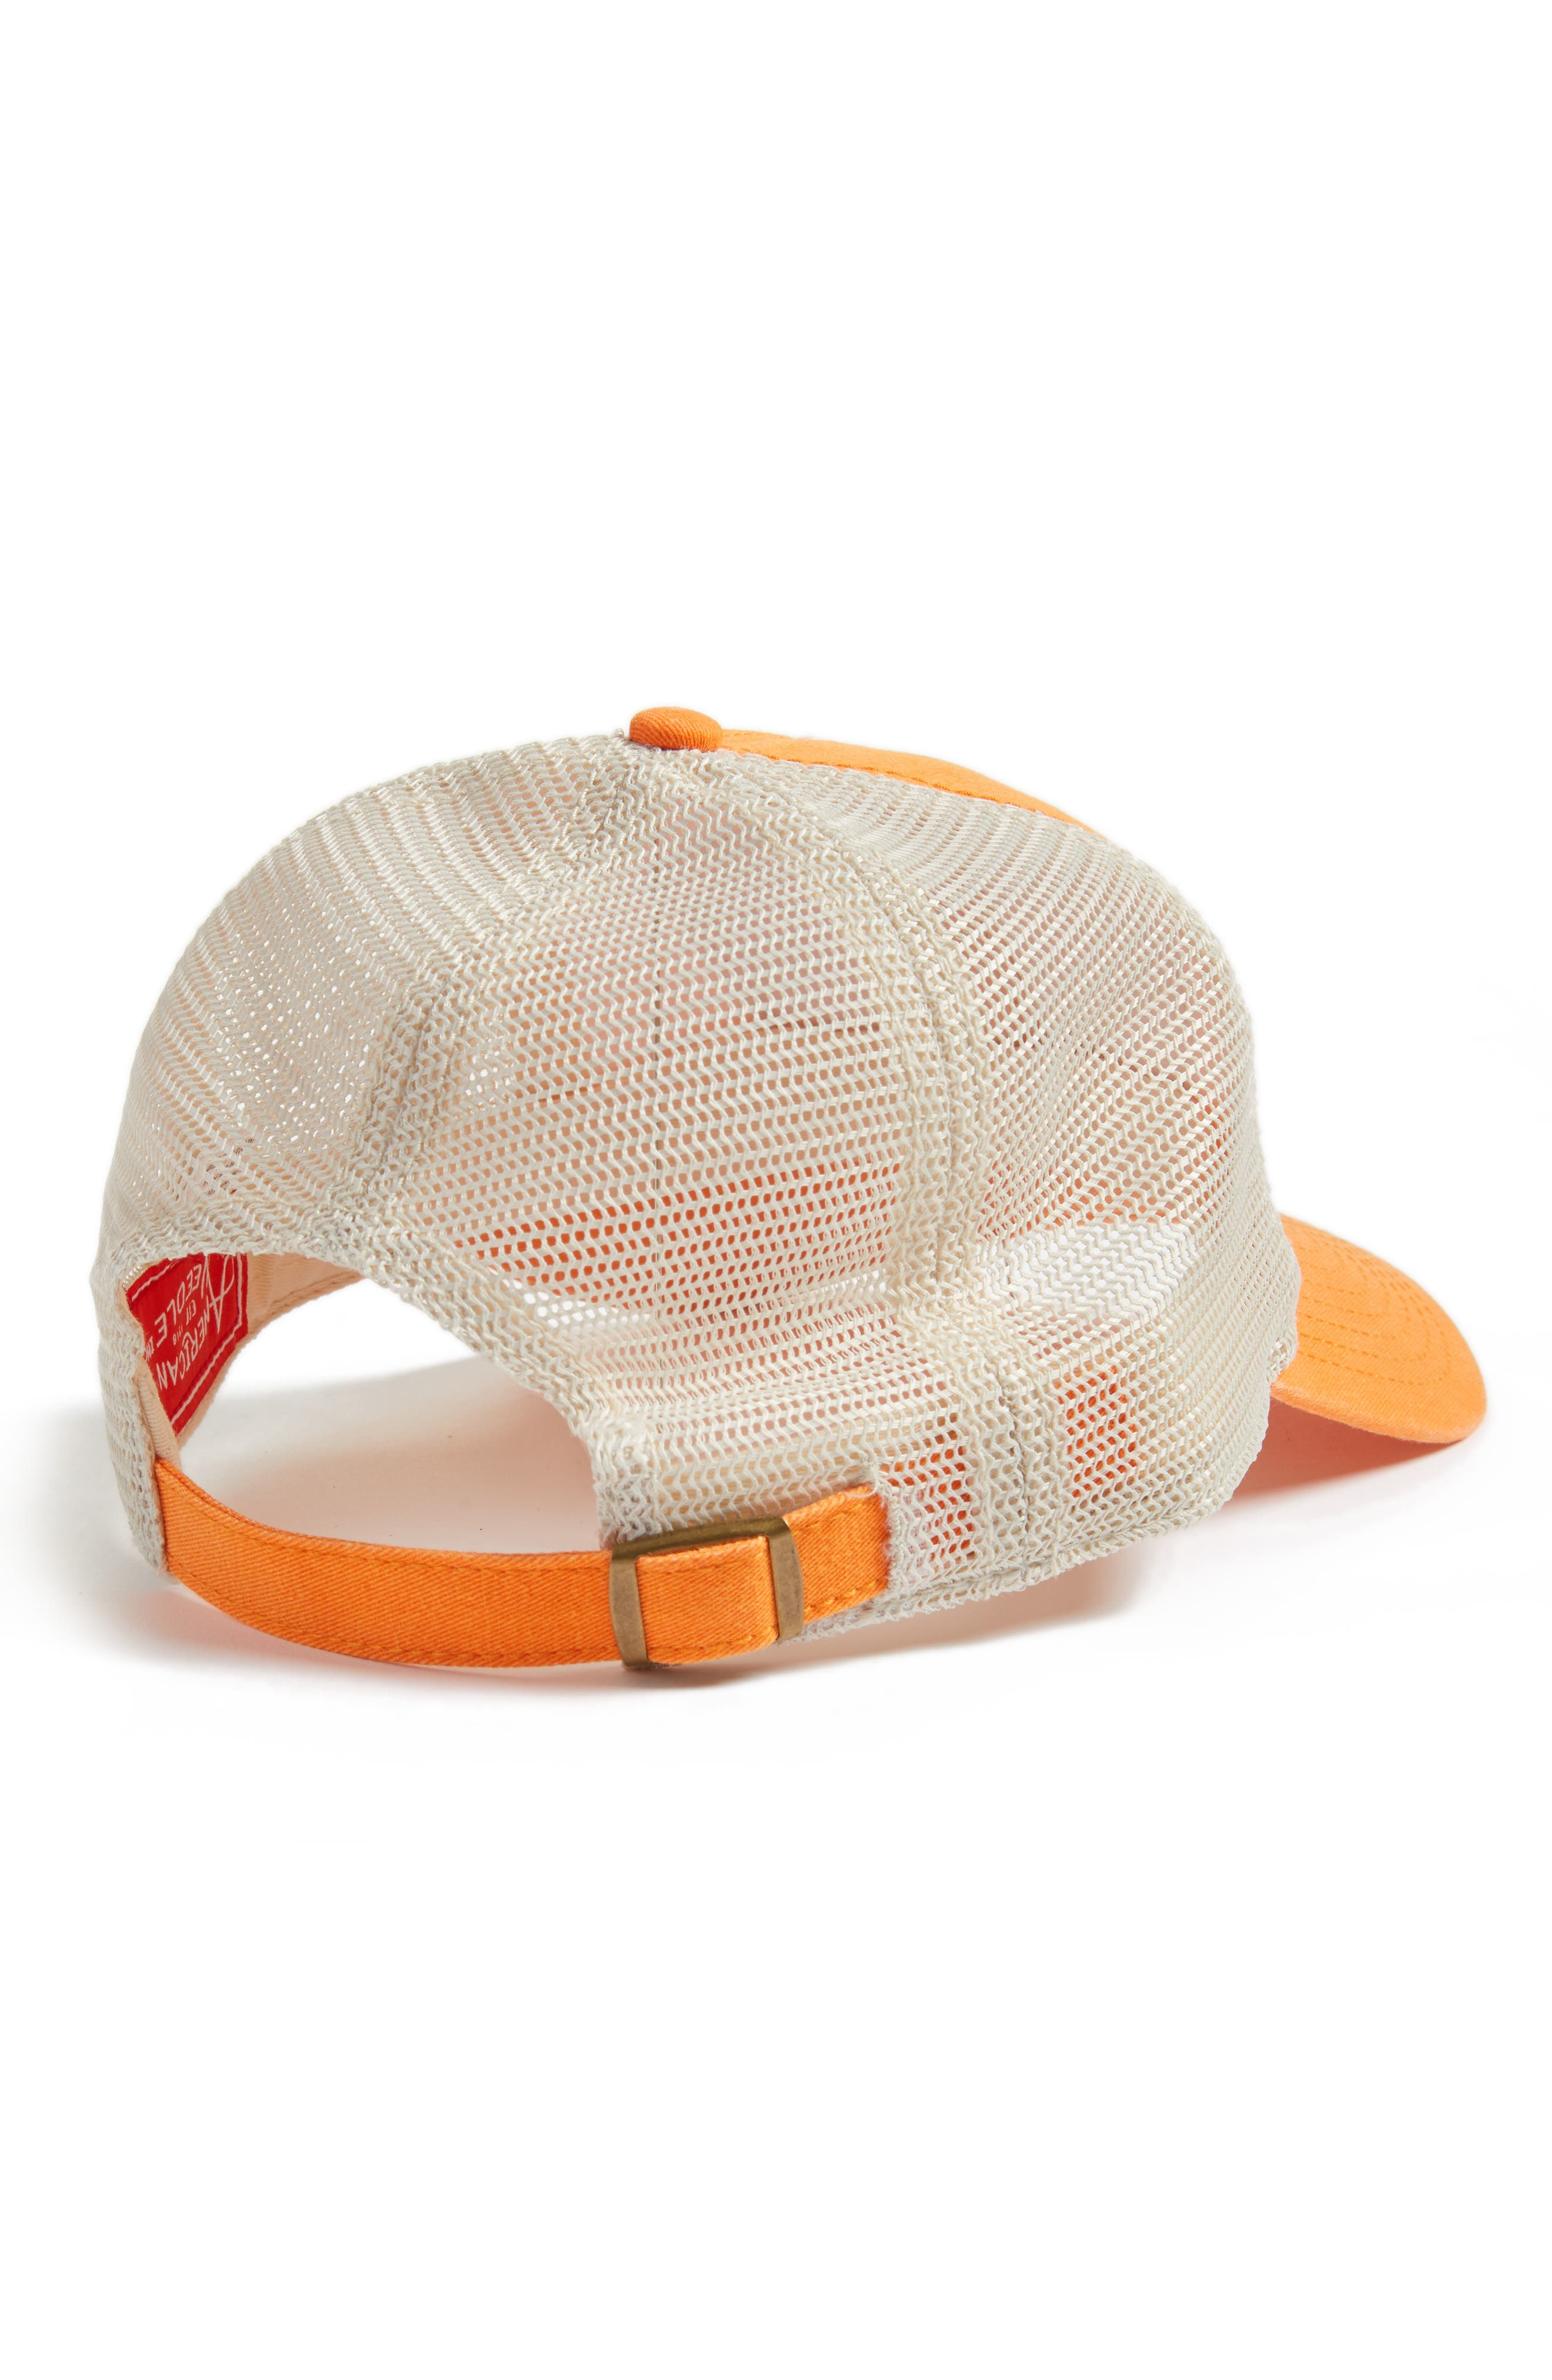 Ravenswood - Destination San Francisco Hat,                             Alternate thumbnail 2, color,                             Ivory/ Orange